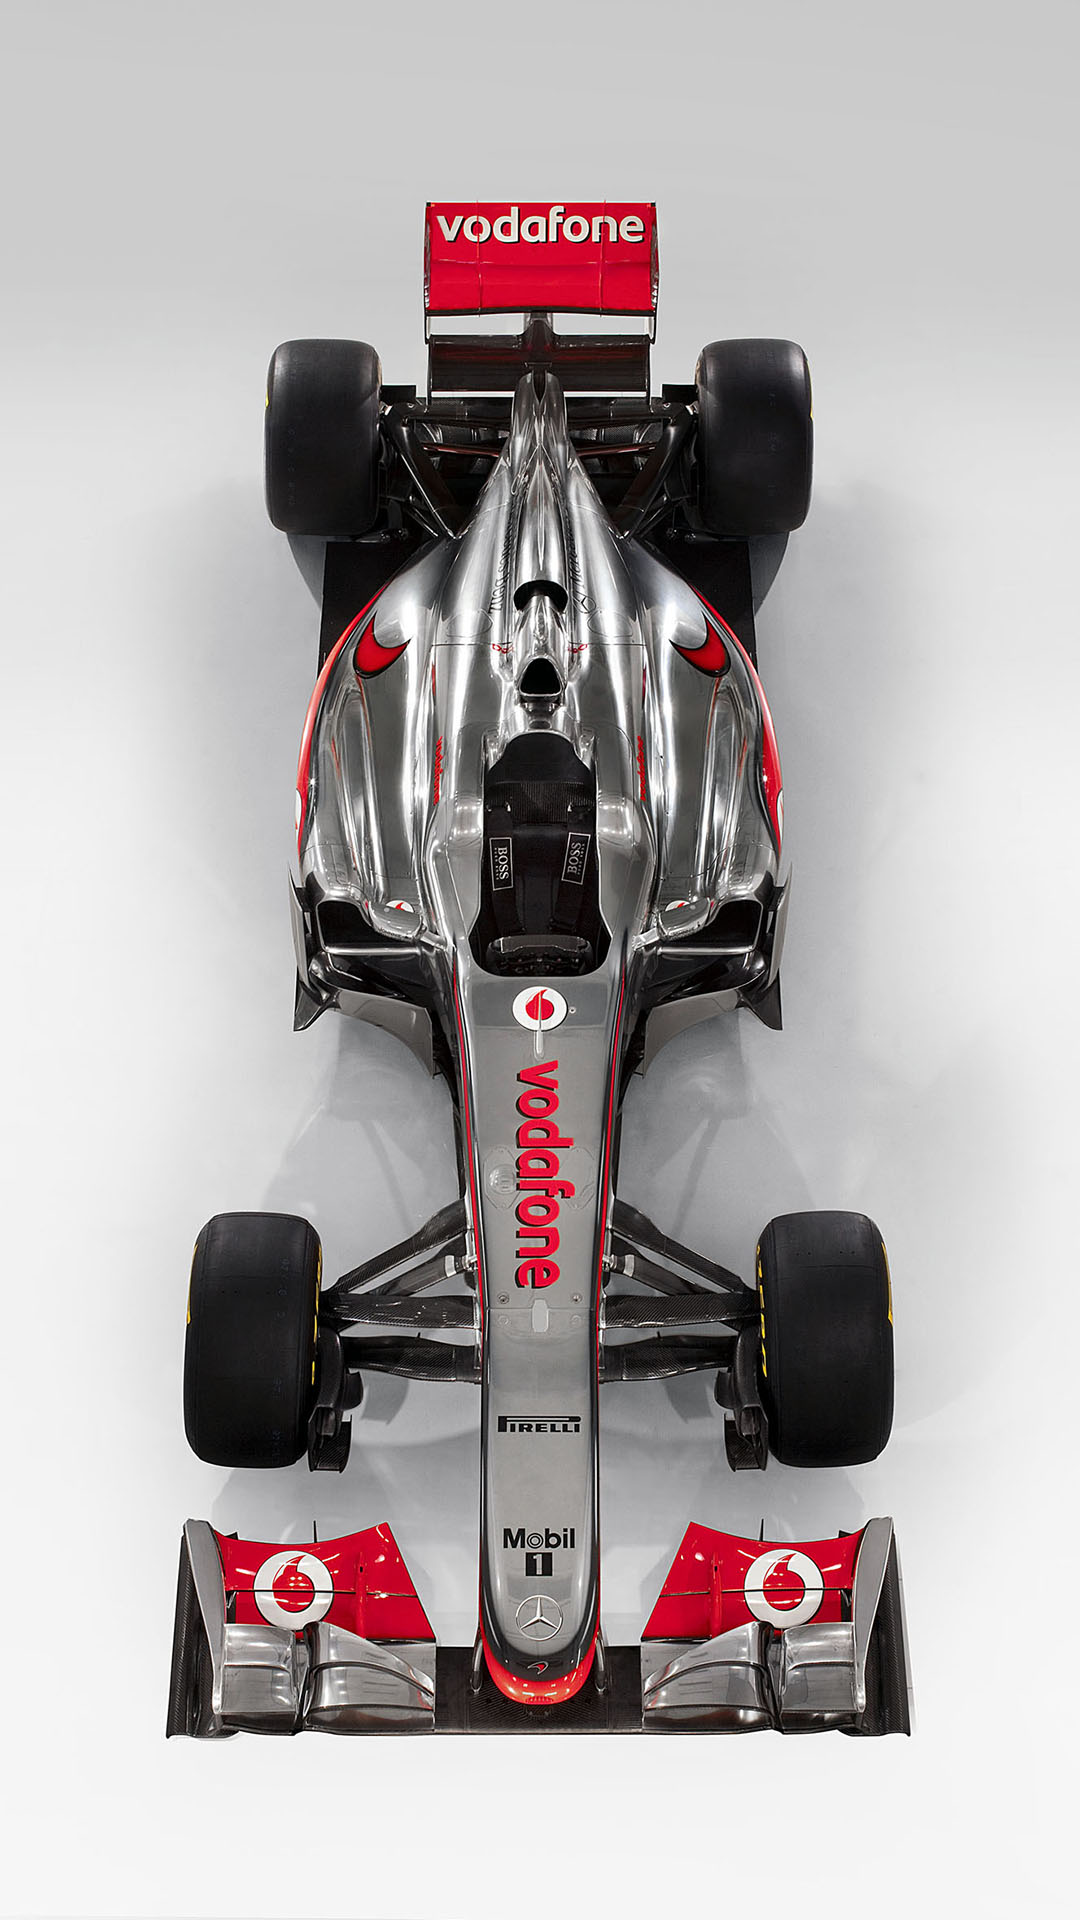 McLaren MP4-26 F1